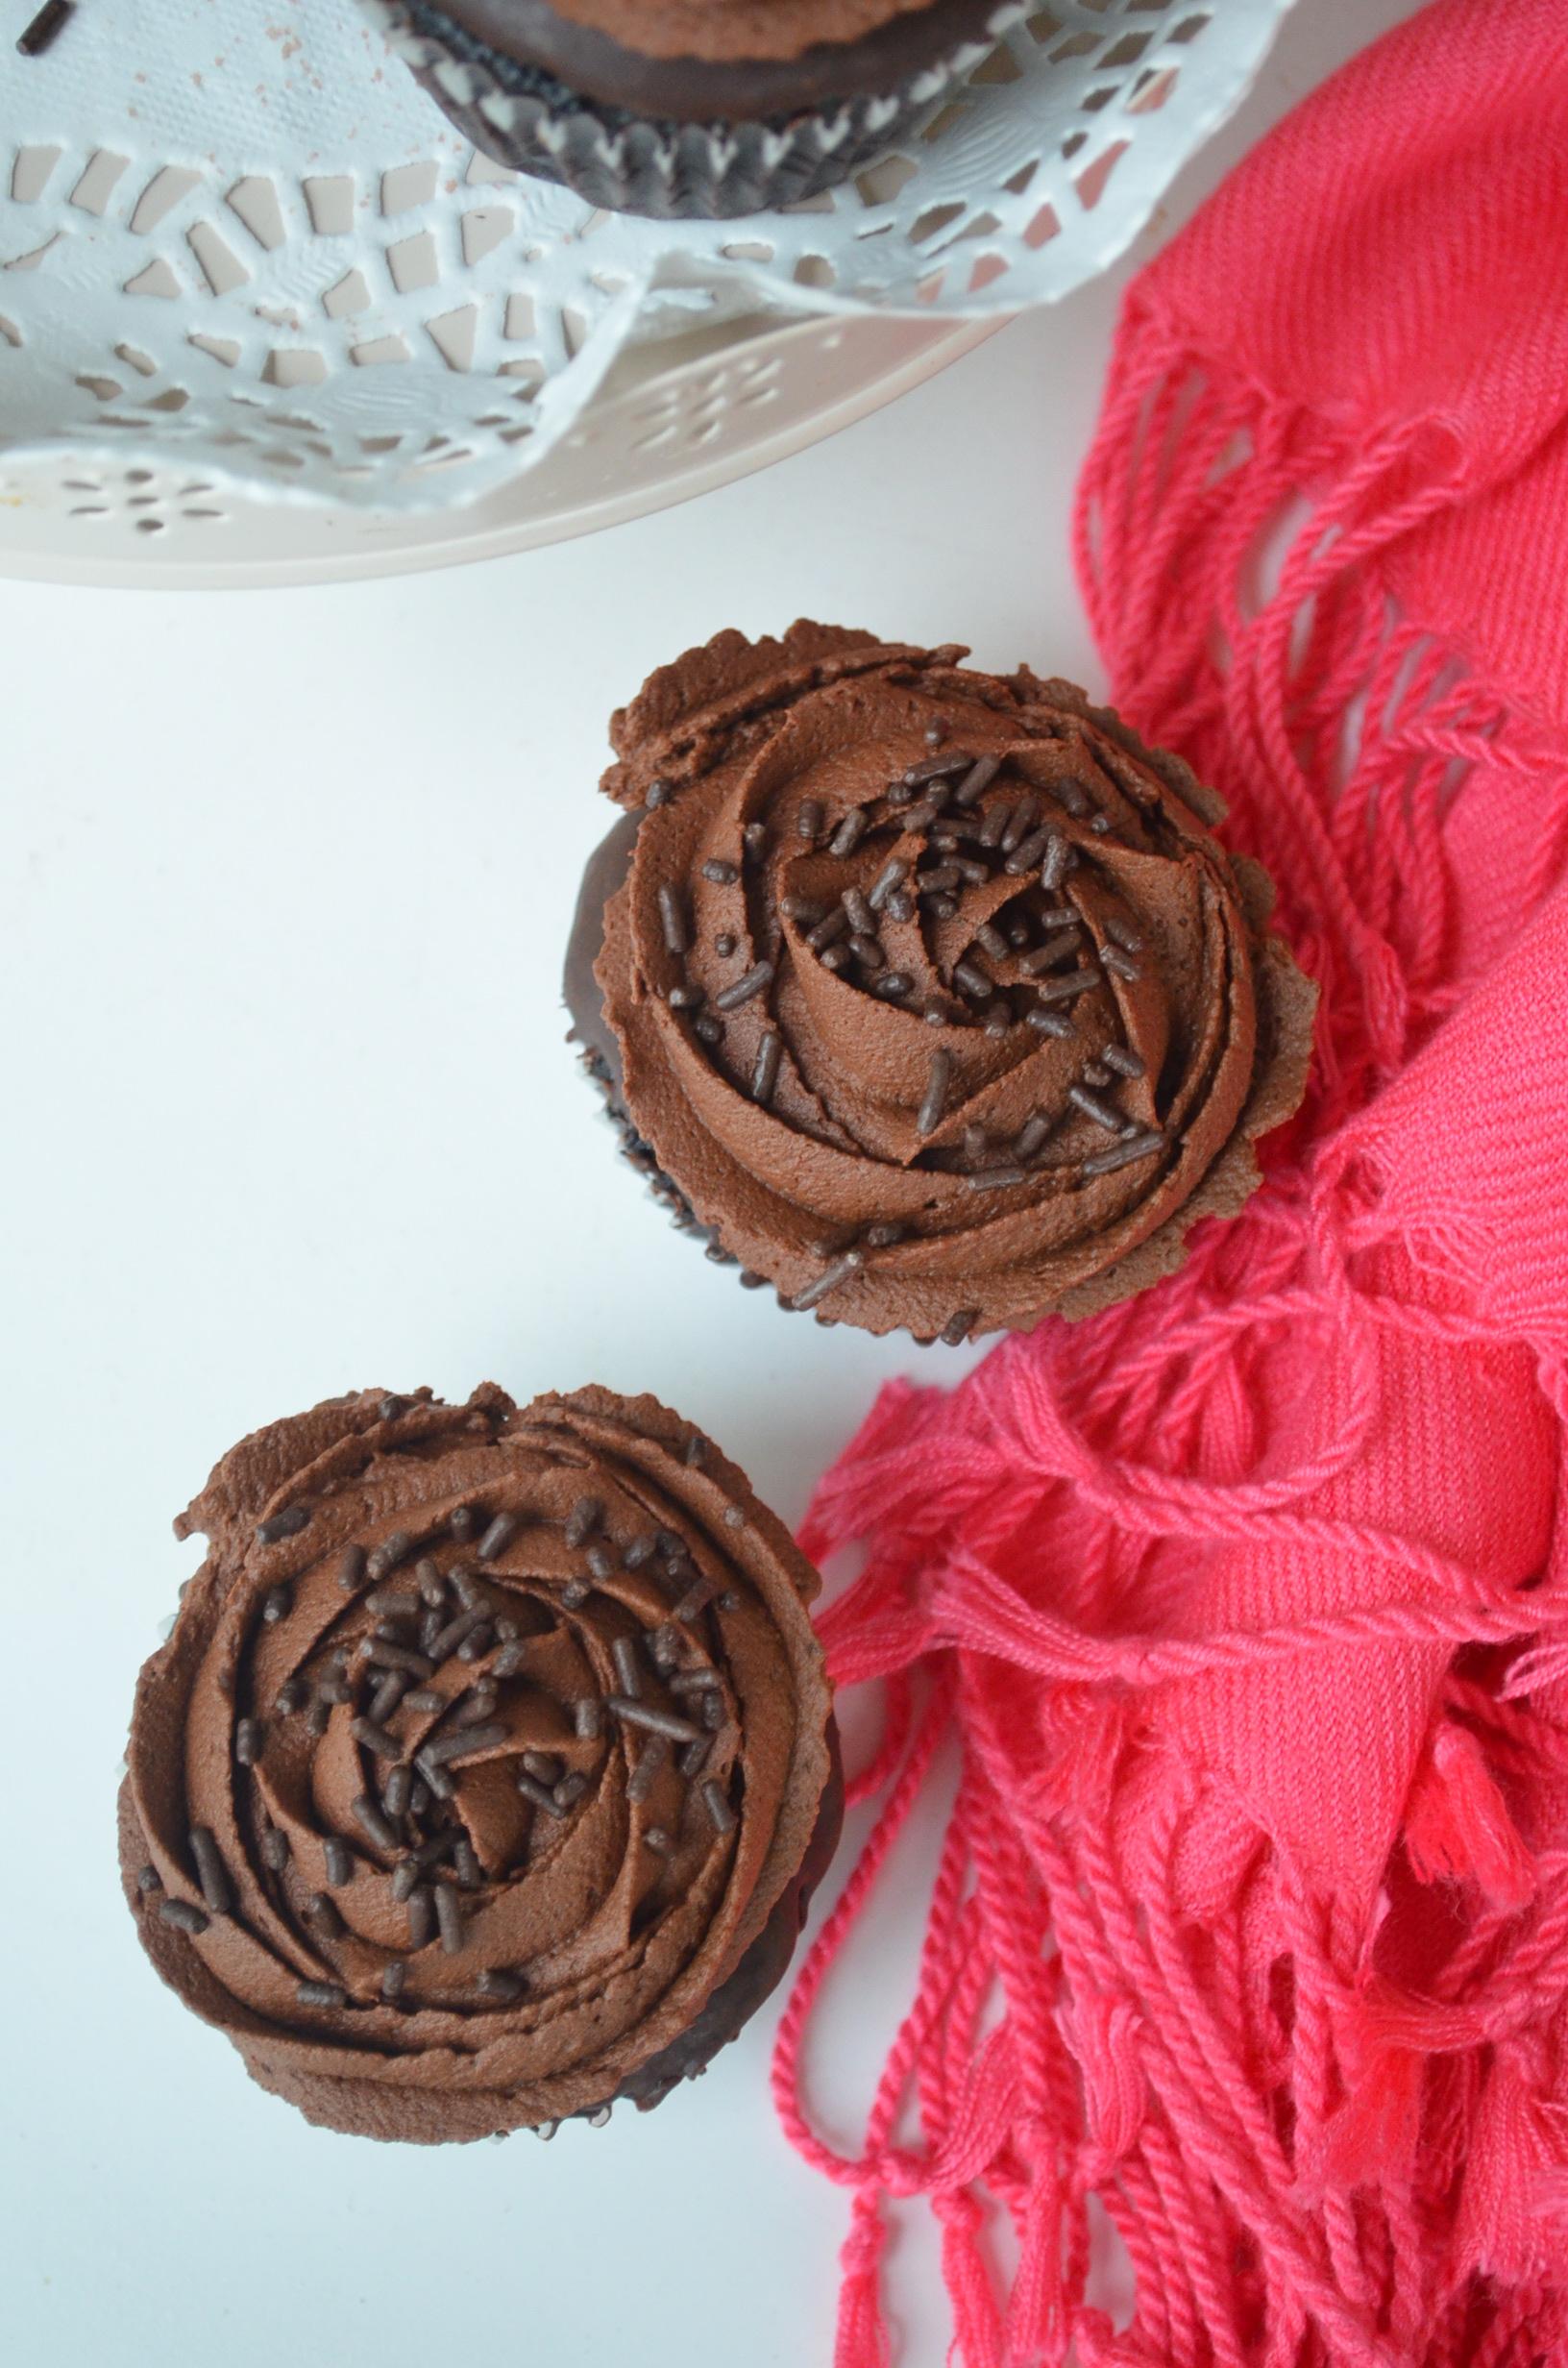 Chocolate Cupcake Recipe with Chocolate Ganache Frosting